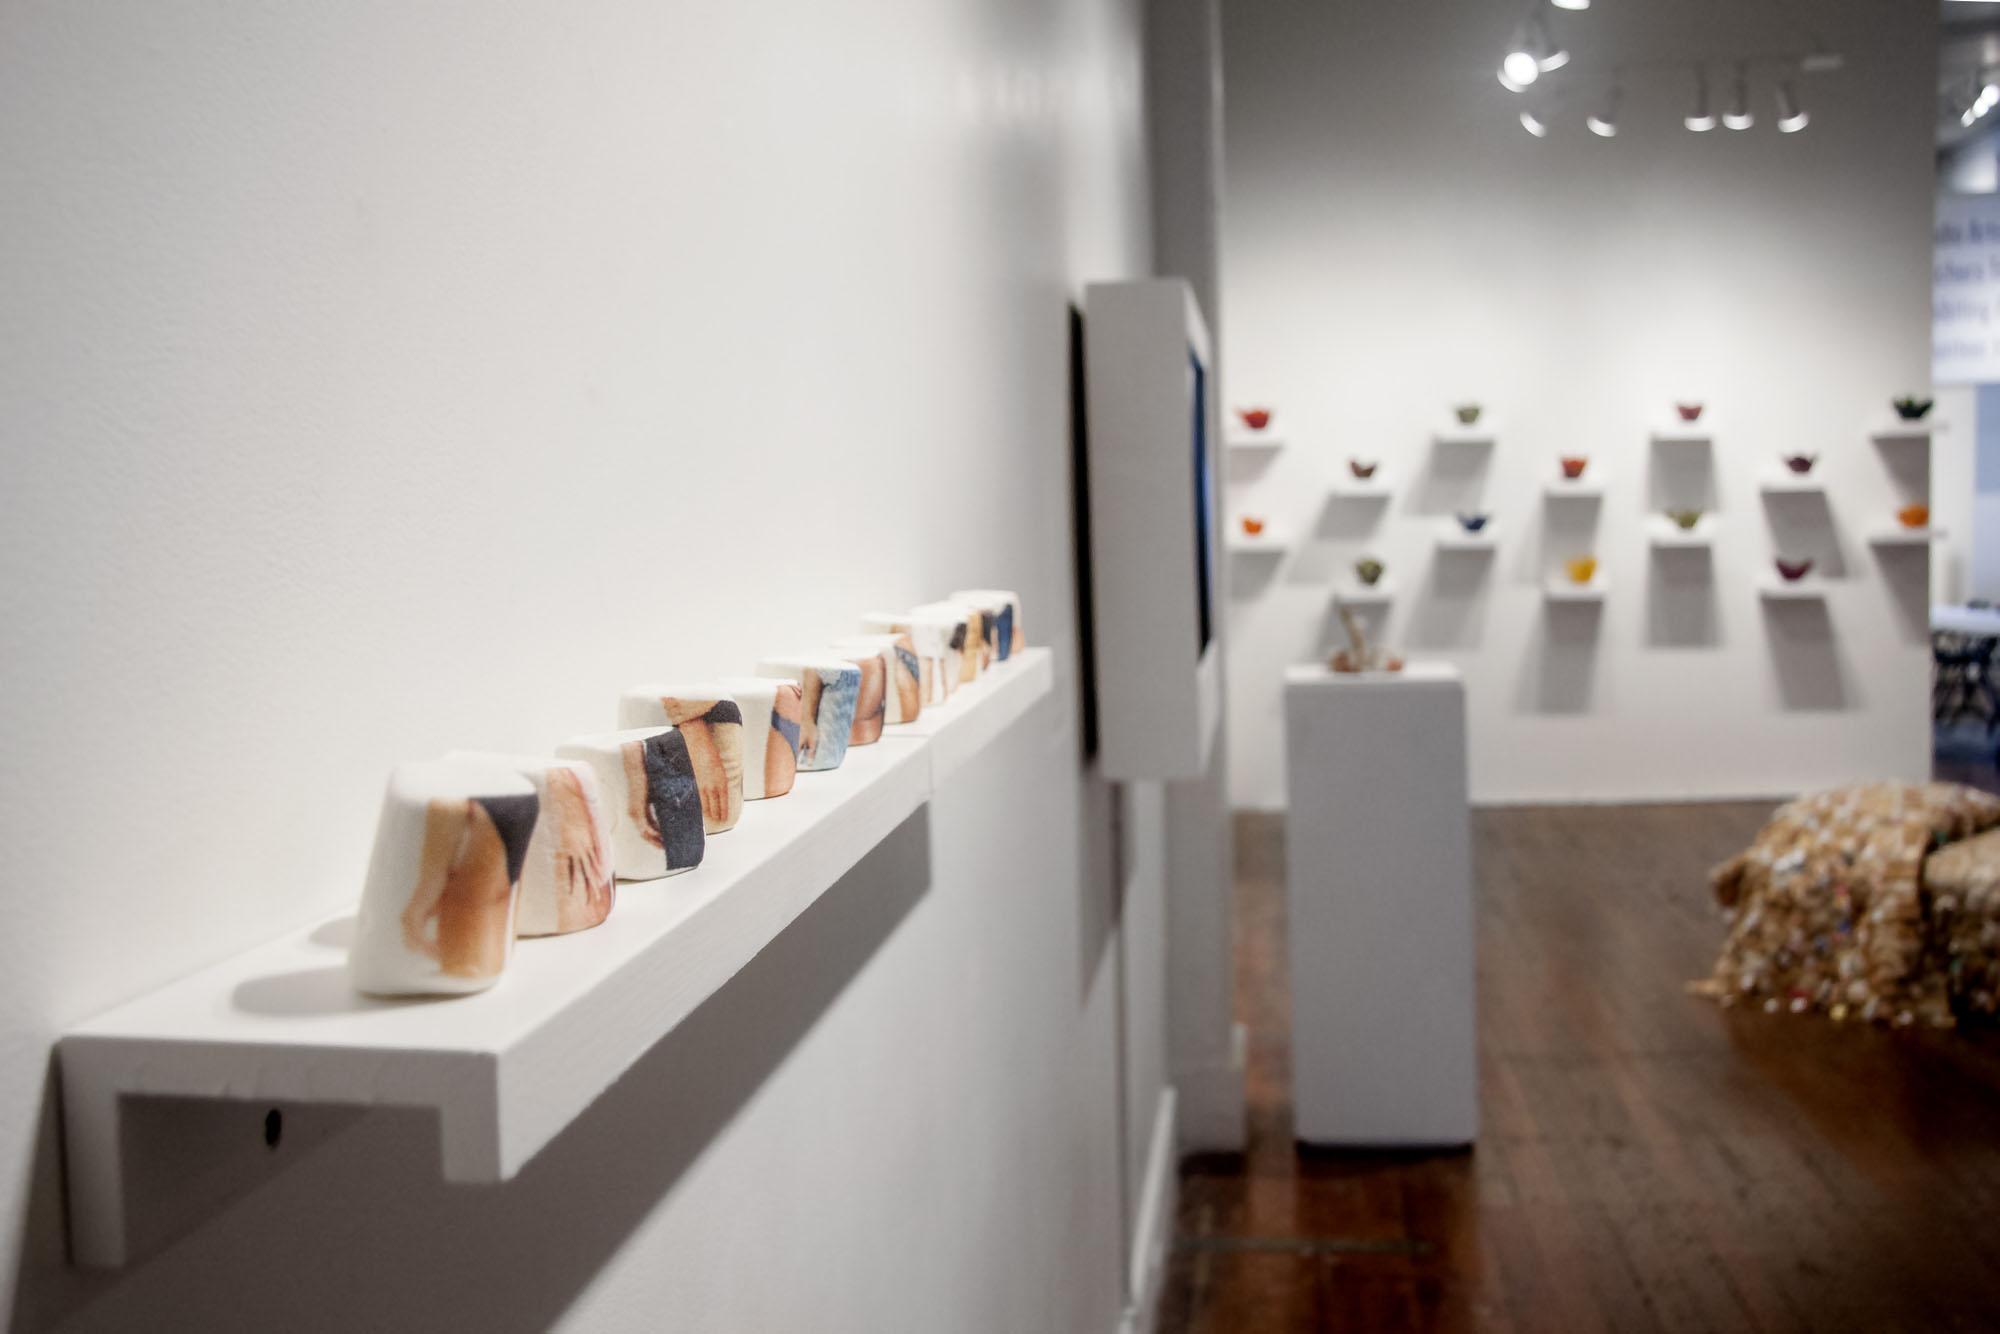 Gallery installation view from Salt Licks